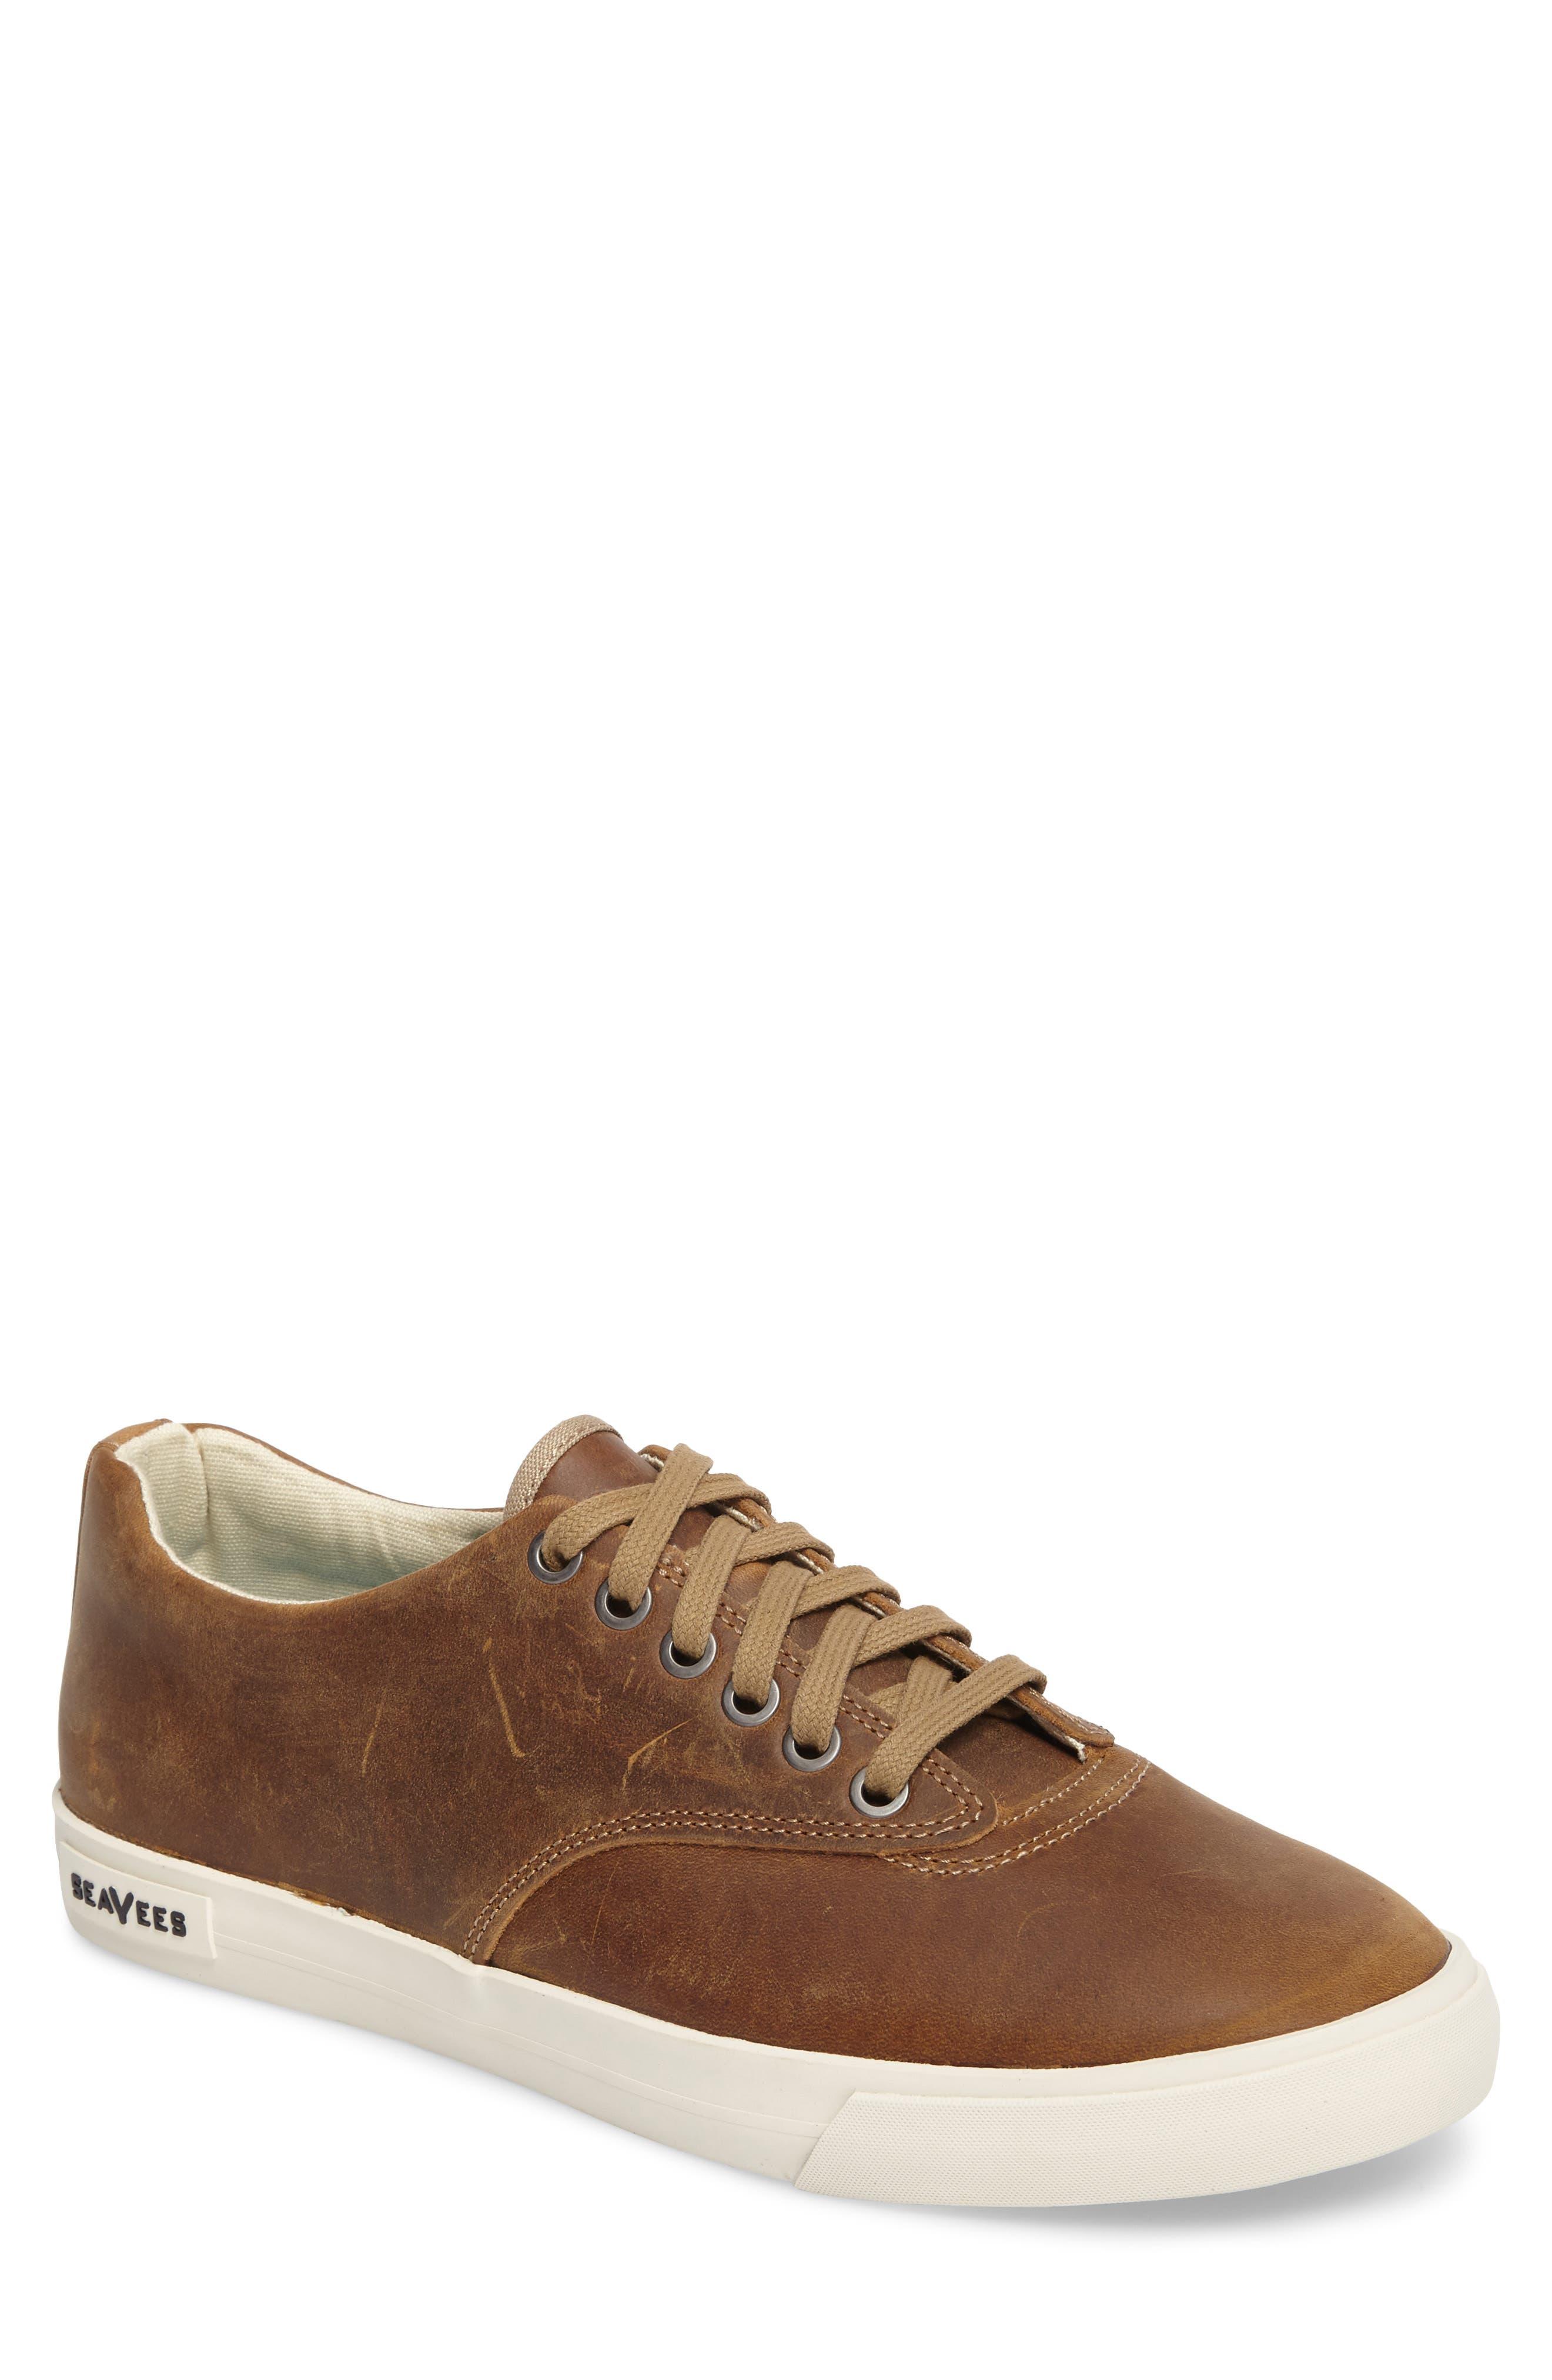 Hermosa Plimsoll Wintertide Sneaker,                             Main thumbnail 1, color,                             Elmwood Leather